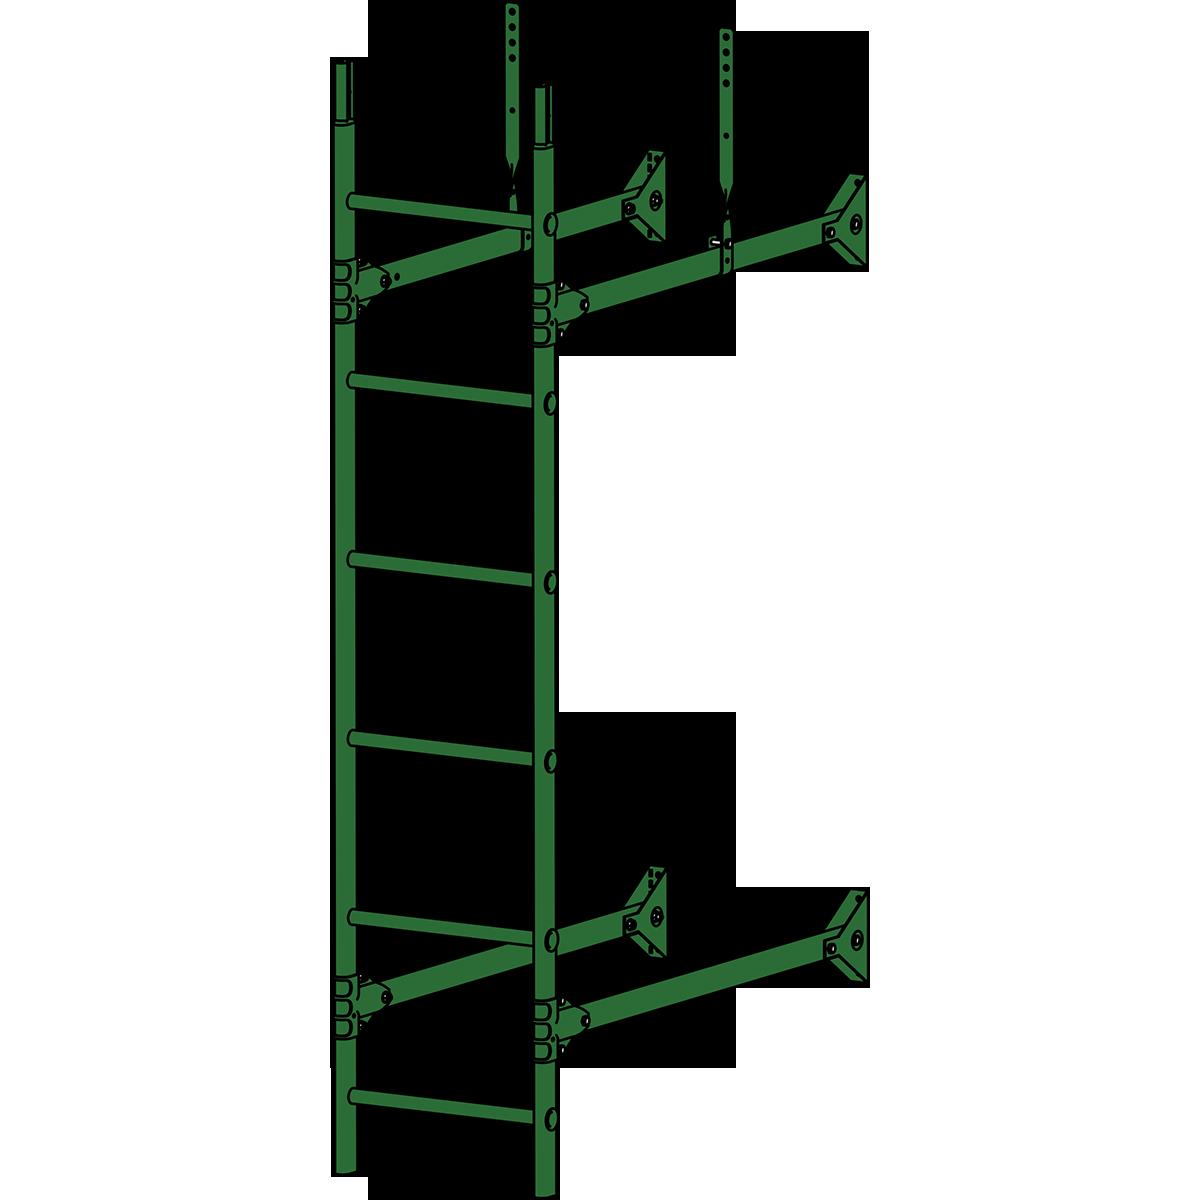 Лестница стеновая ROOFSYSTEMS PRESTIGE ZN 1,2 м RAL 6002 Зеленый лист